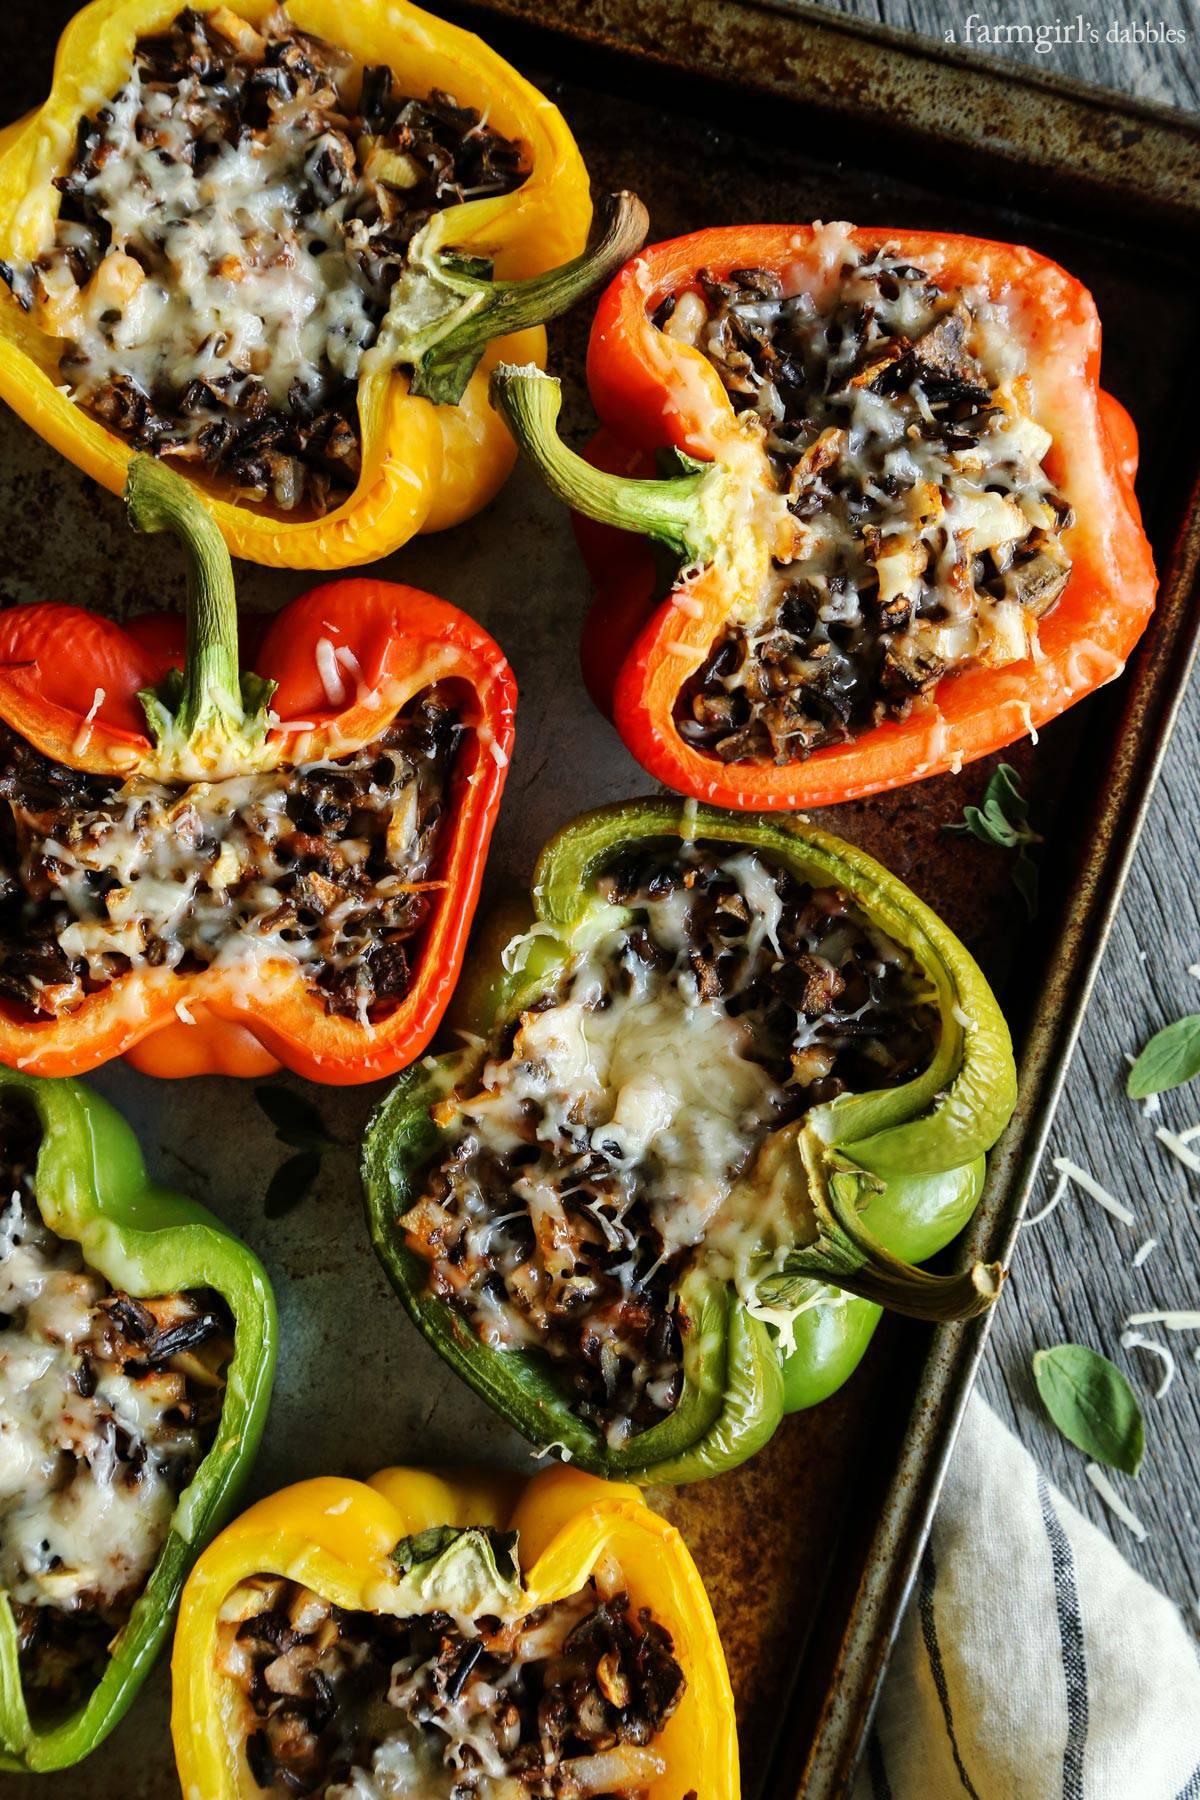 Mushroom and Wild Rice Stuffed Peppers from afarmgirlsdabbles.com